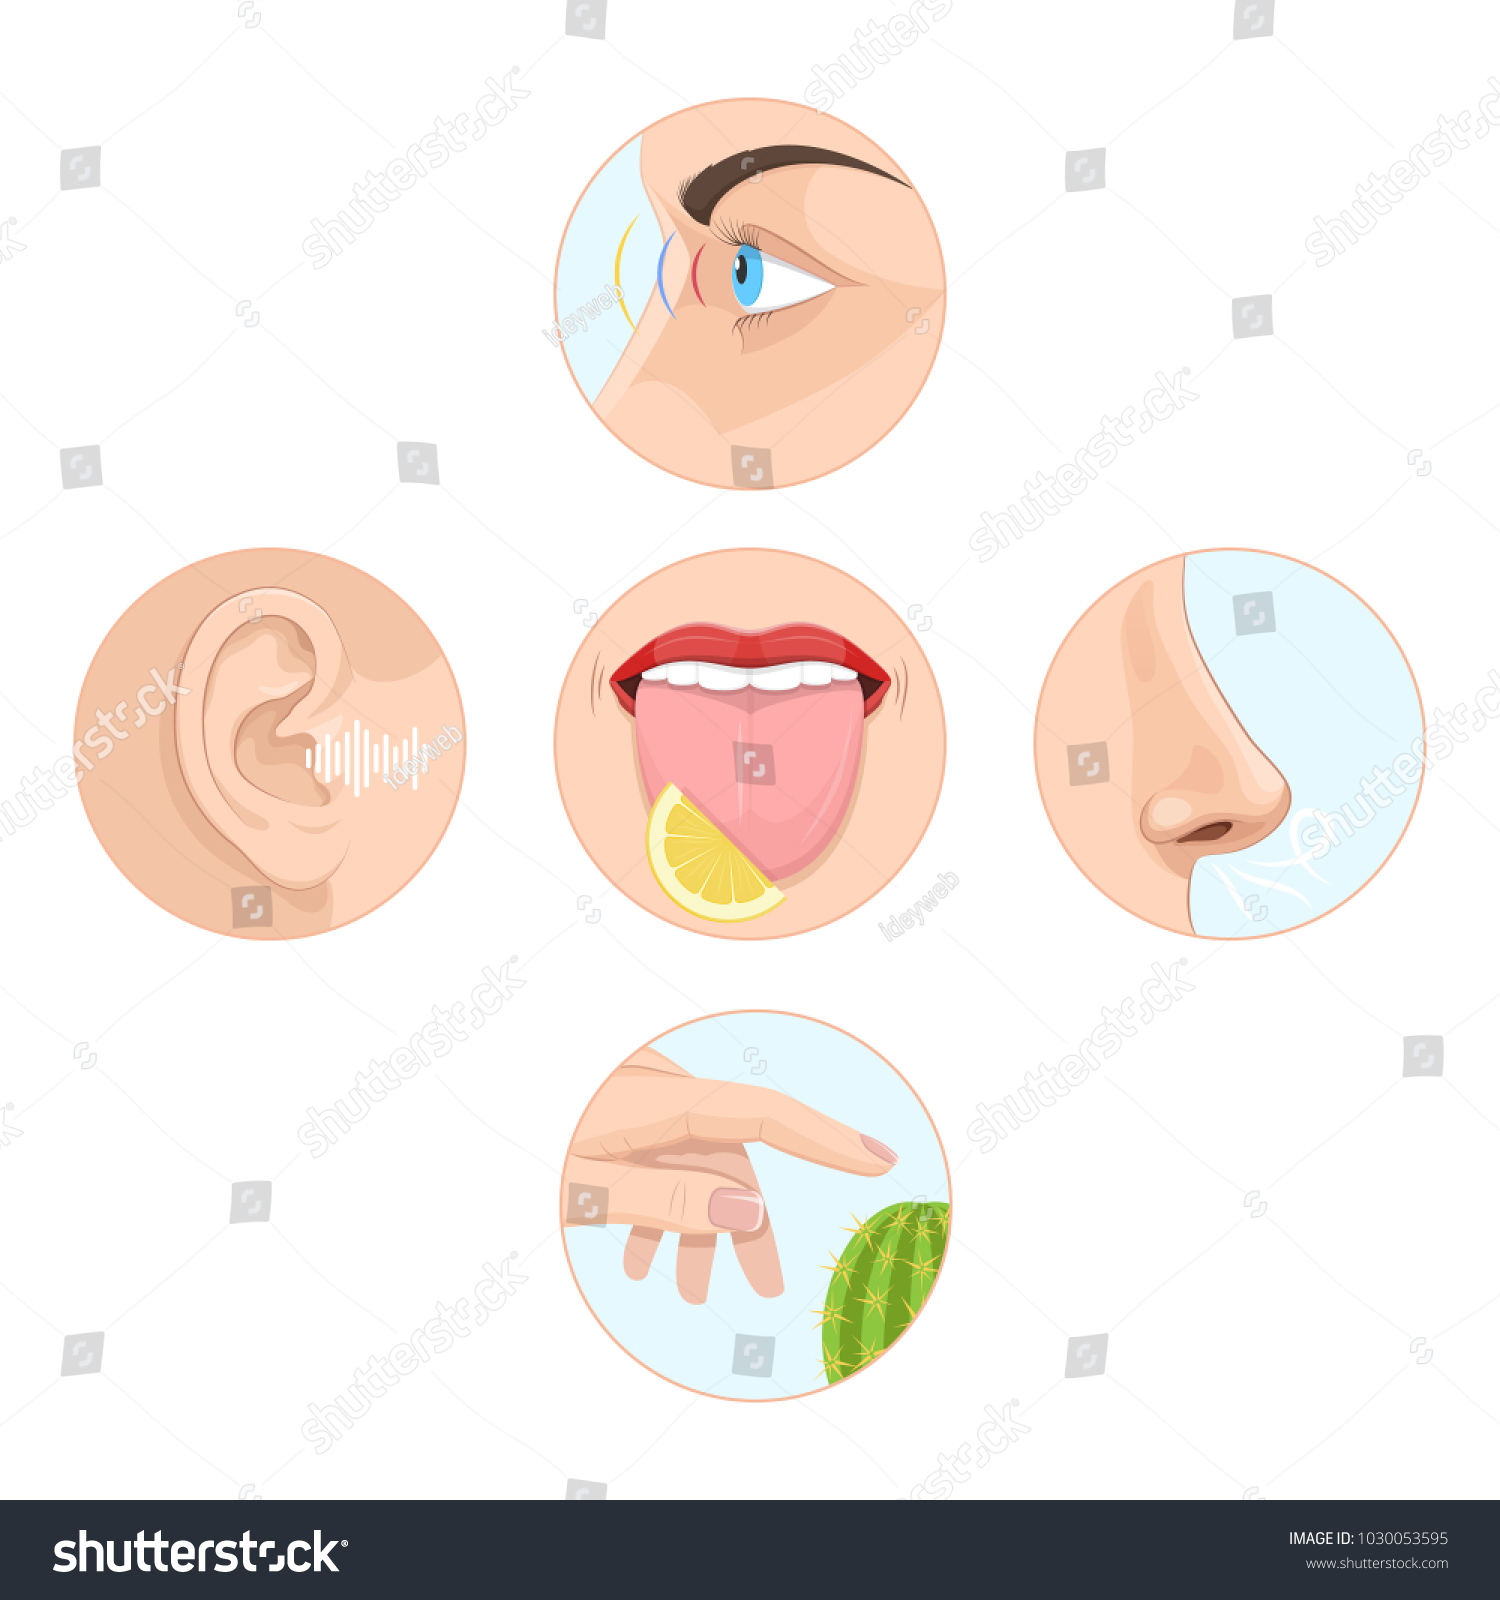 Set Five Senses Man Anatomy Human Stock Vektorgrafik Lizenzfrei